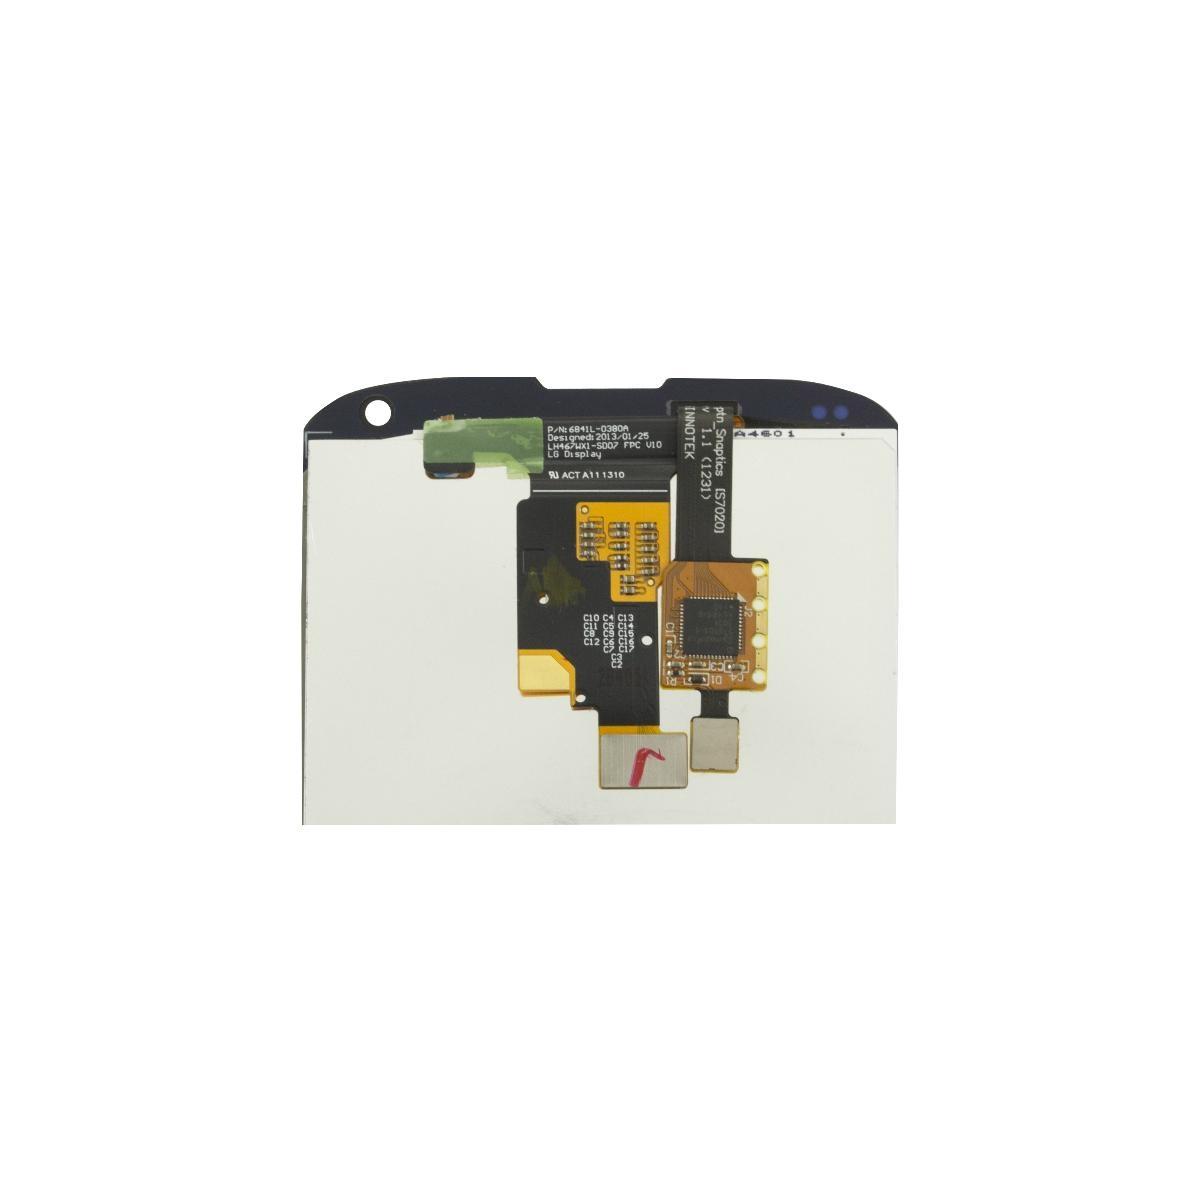 LG Google Nexus 4 E960 LCD & Touch Screen Digitizer Replacement 3